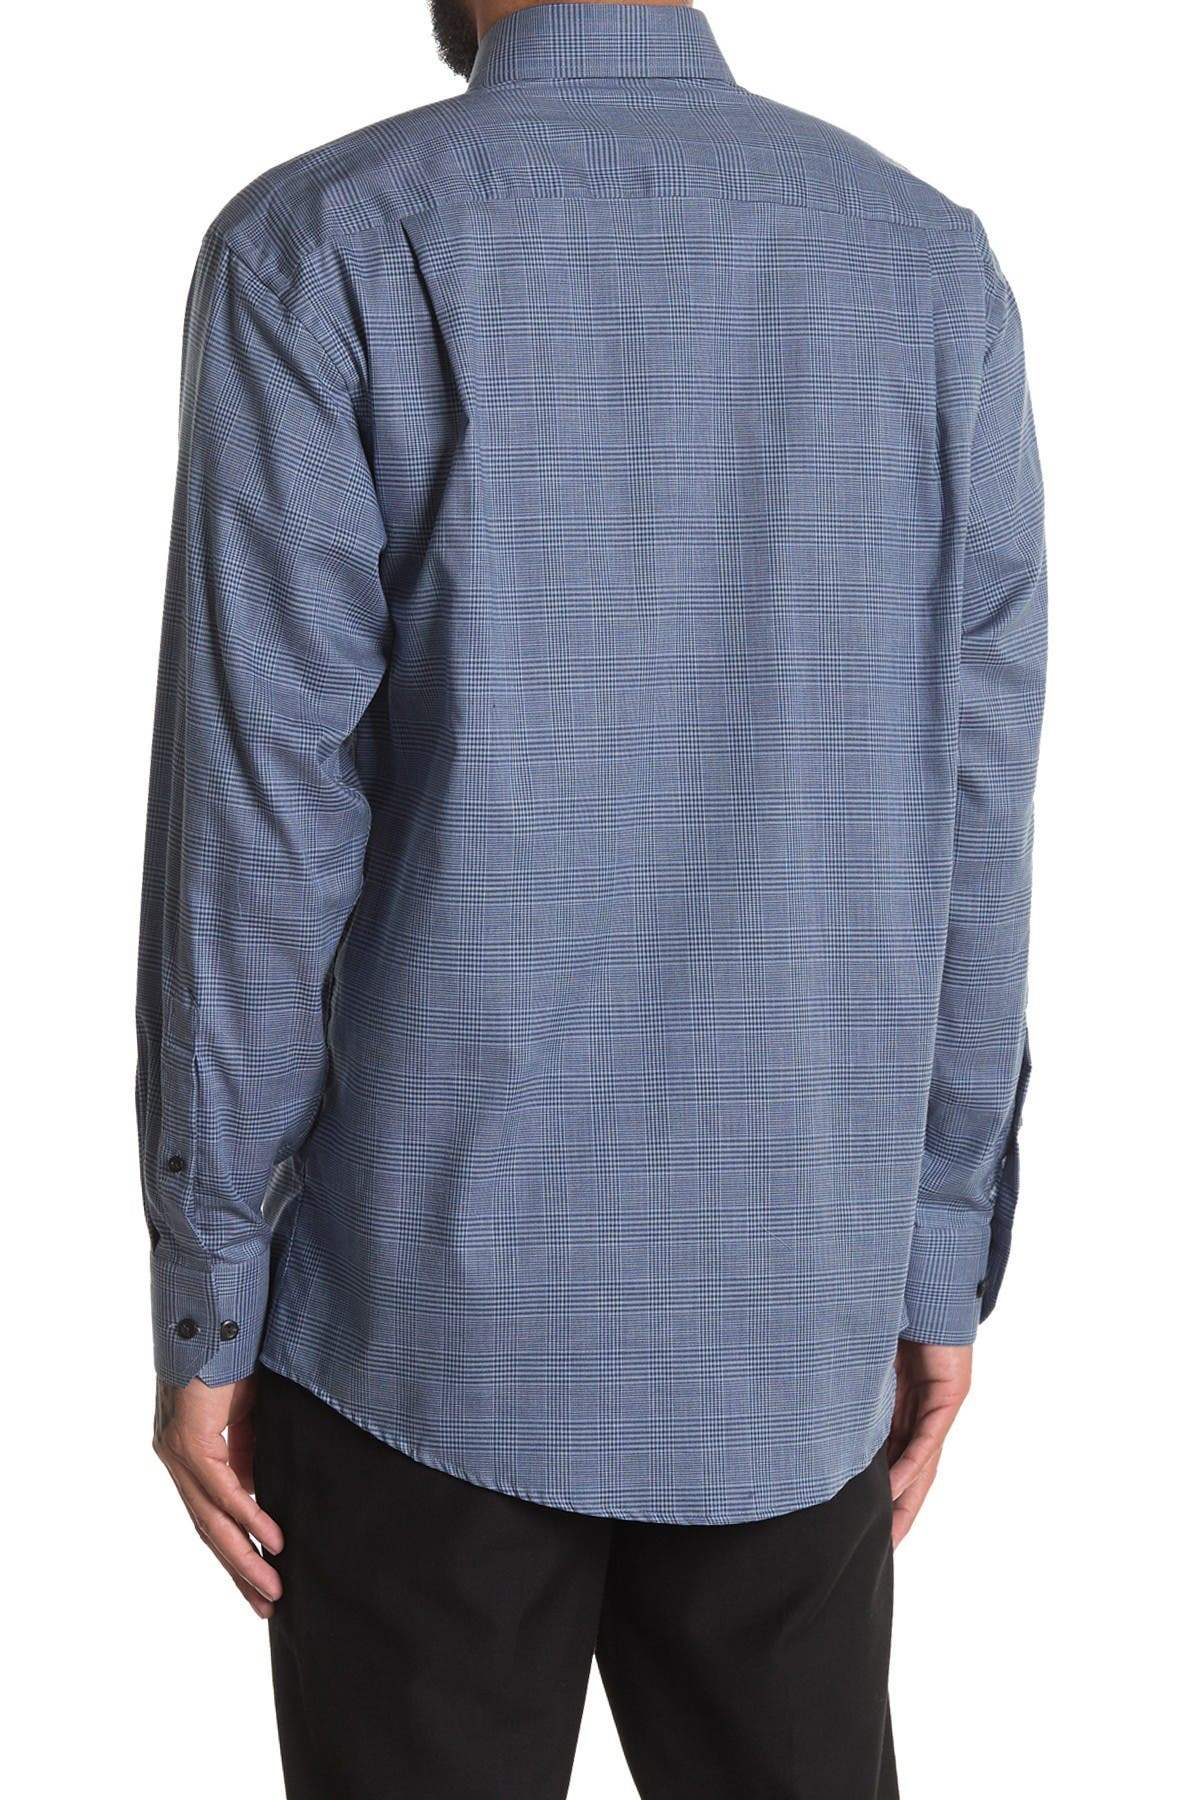 Image of Eton Check Print Classic Fit Dress Shirt